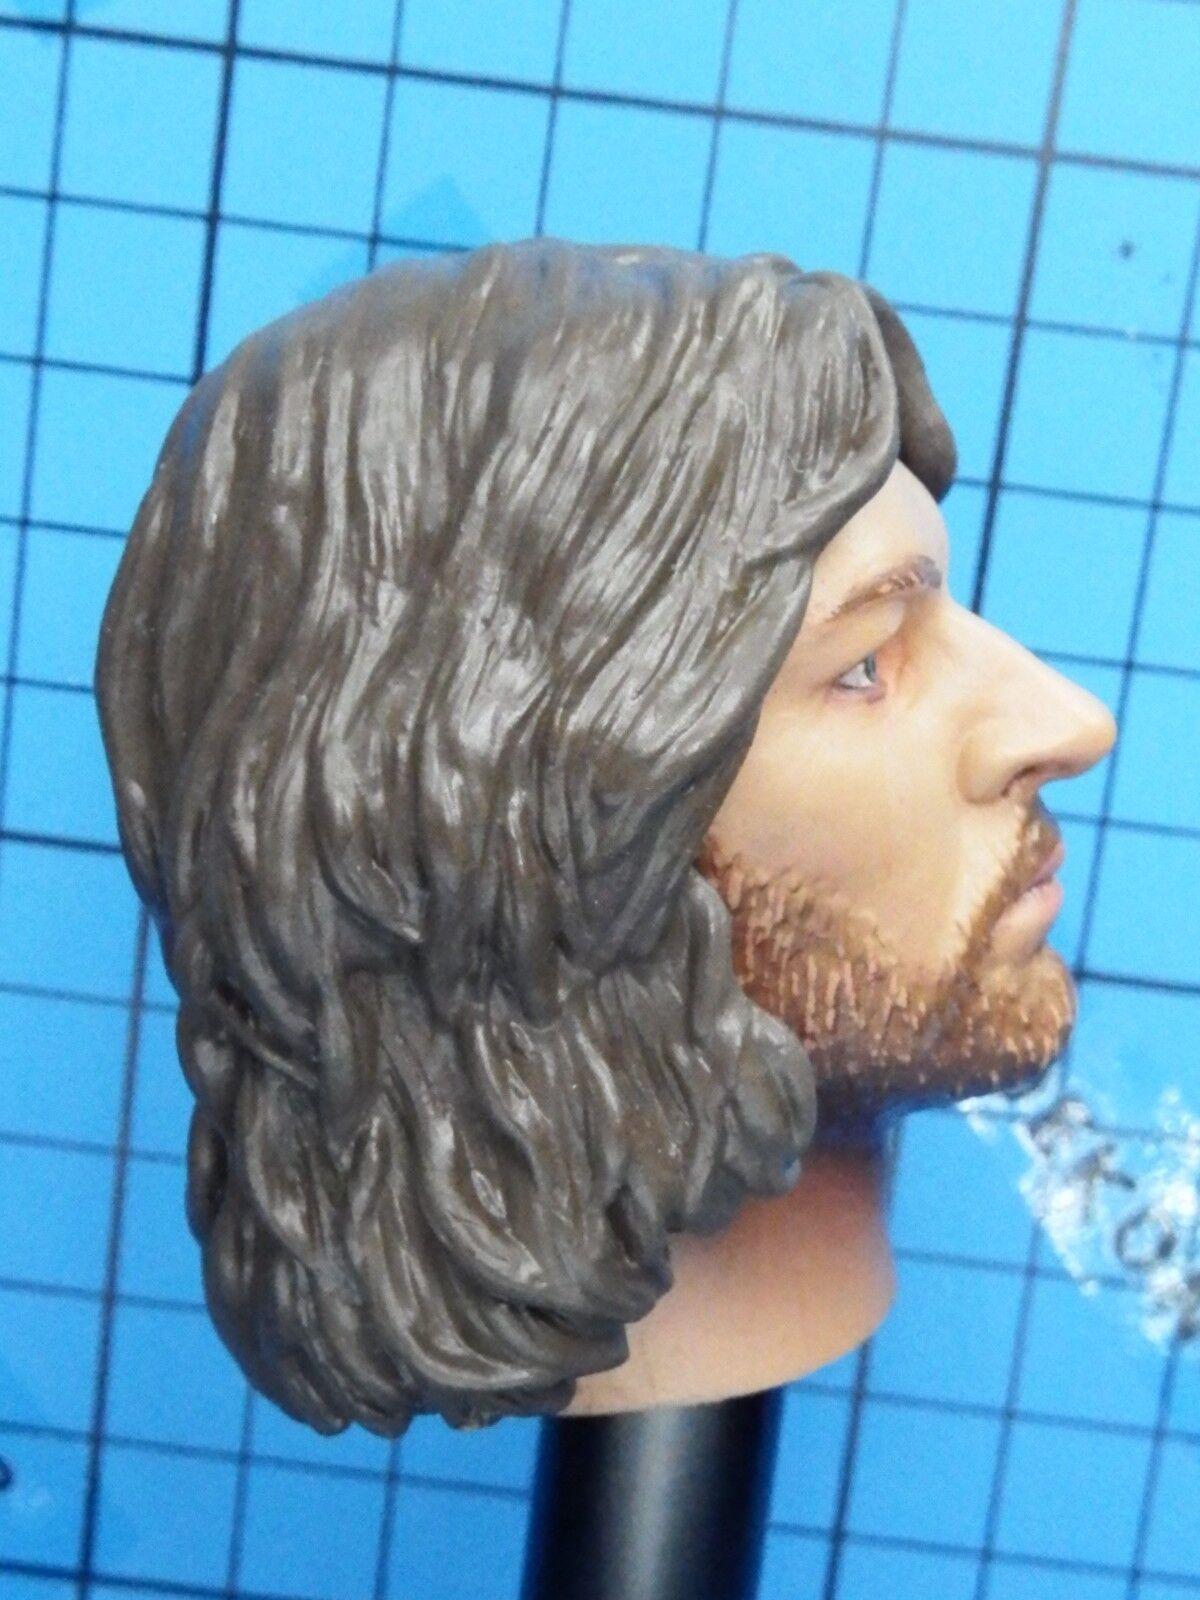 Sideshow 1 6 Lord Of The Rings Faramir Faramir Faramir  Son Of Denethor Figure - Wenham Head 1d982e